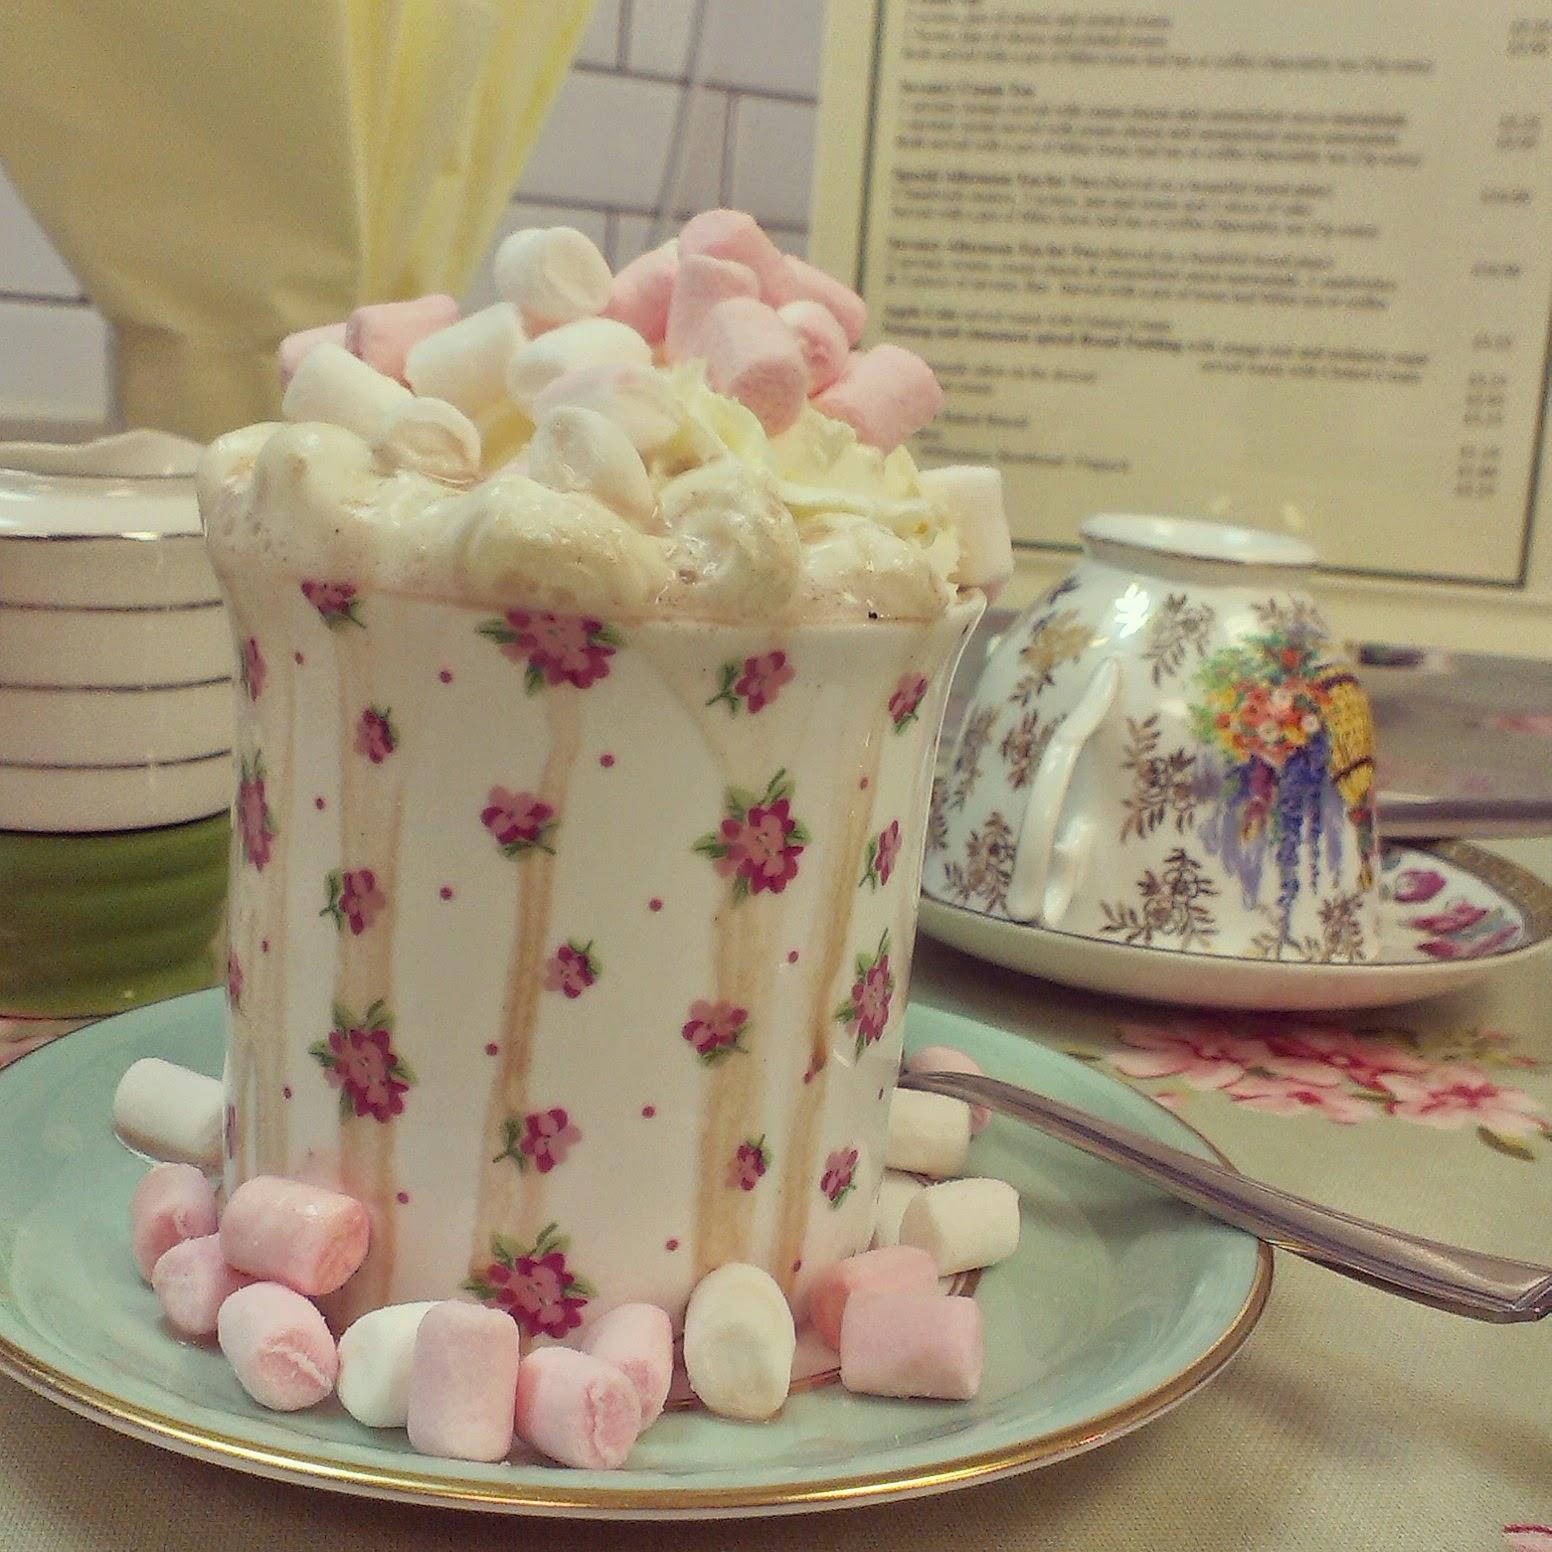 Gooey hot chocolate